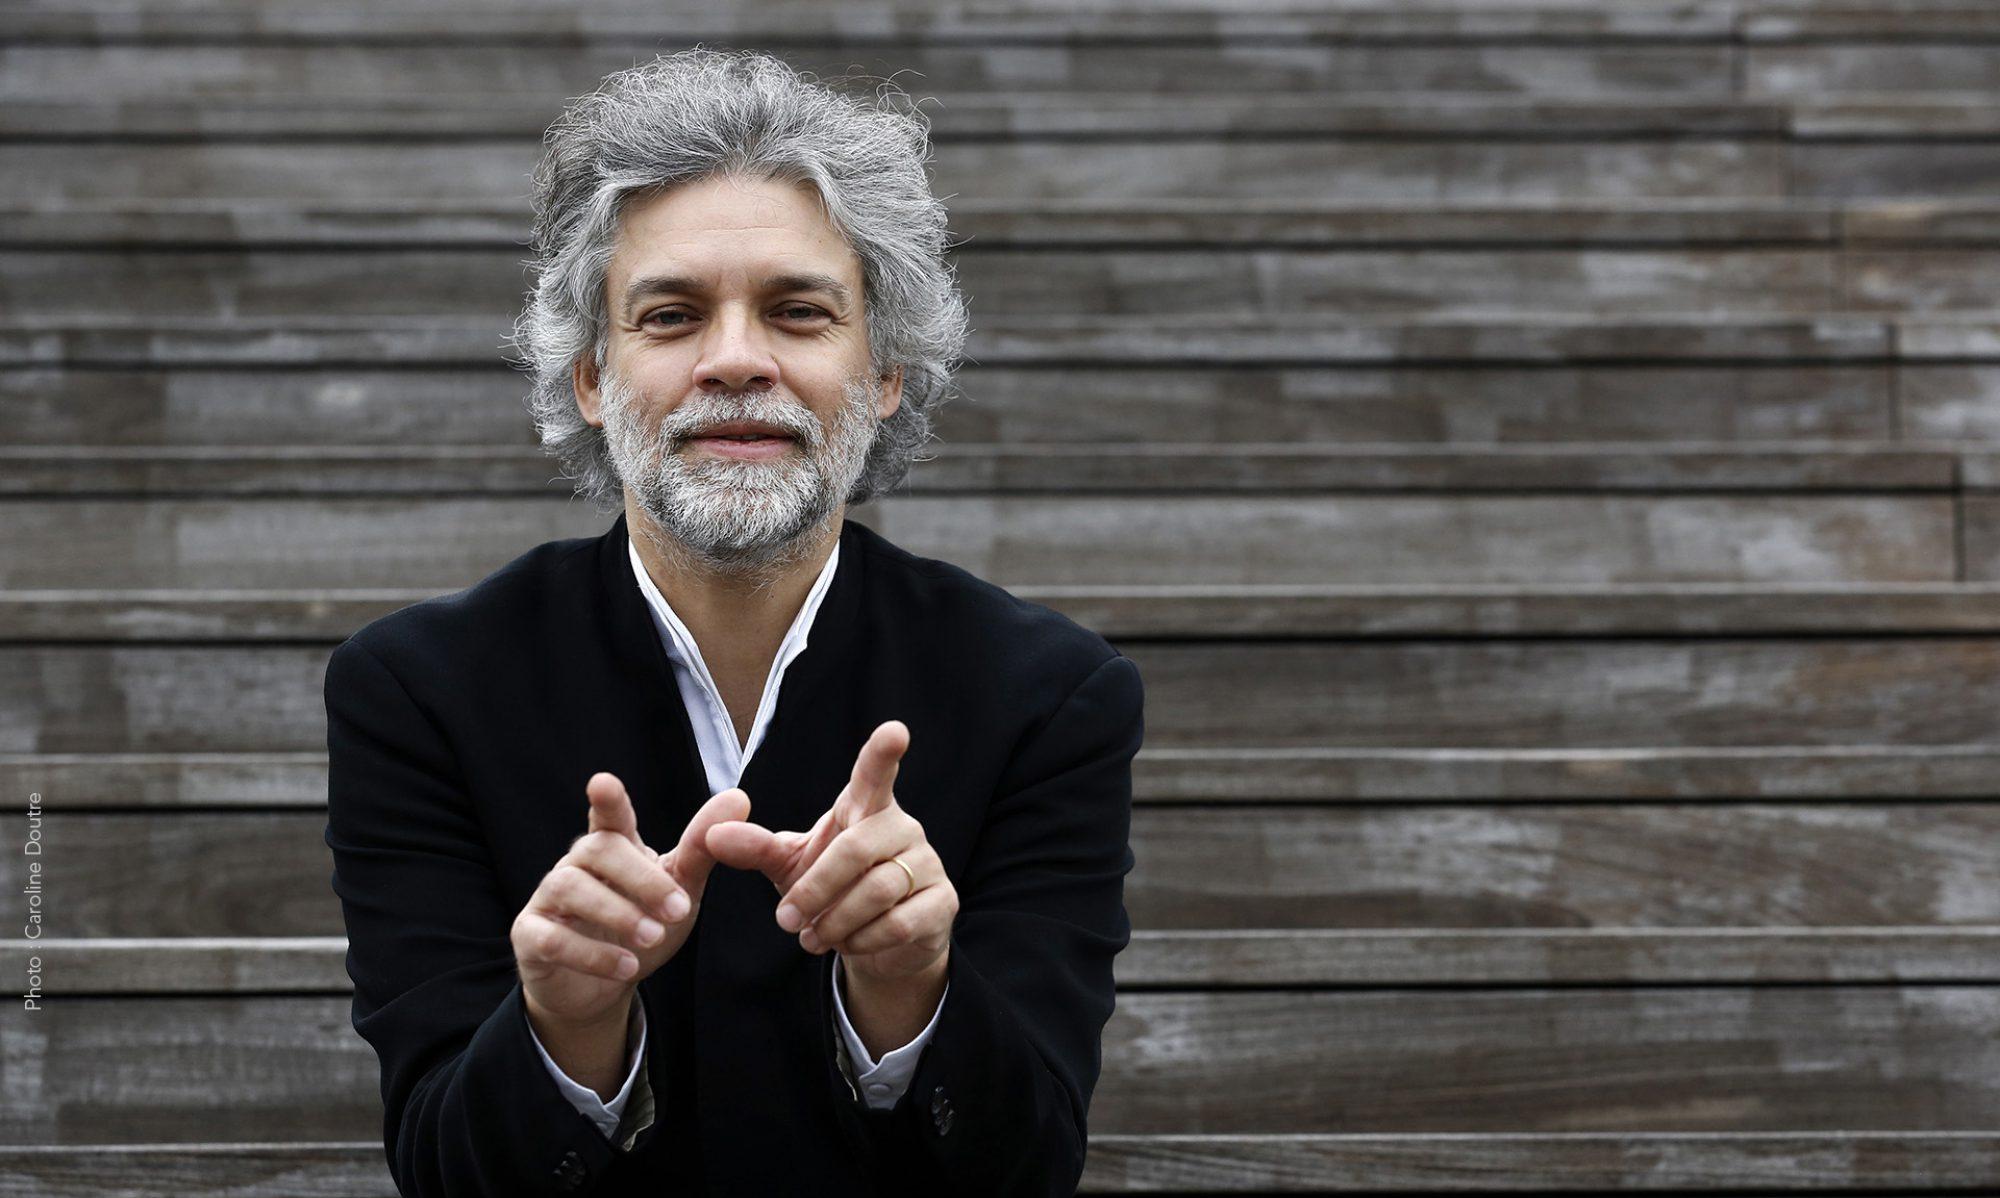 François-Frédéric GUY, pianist